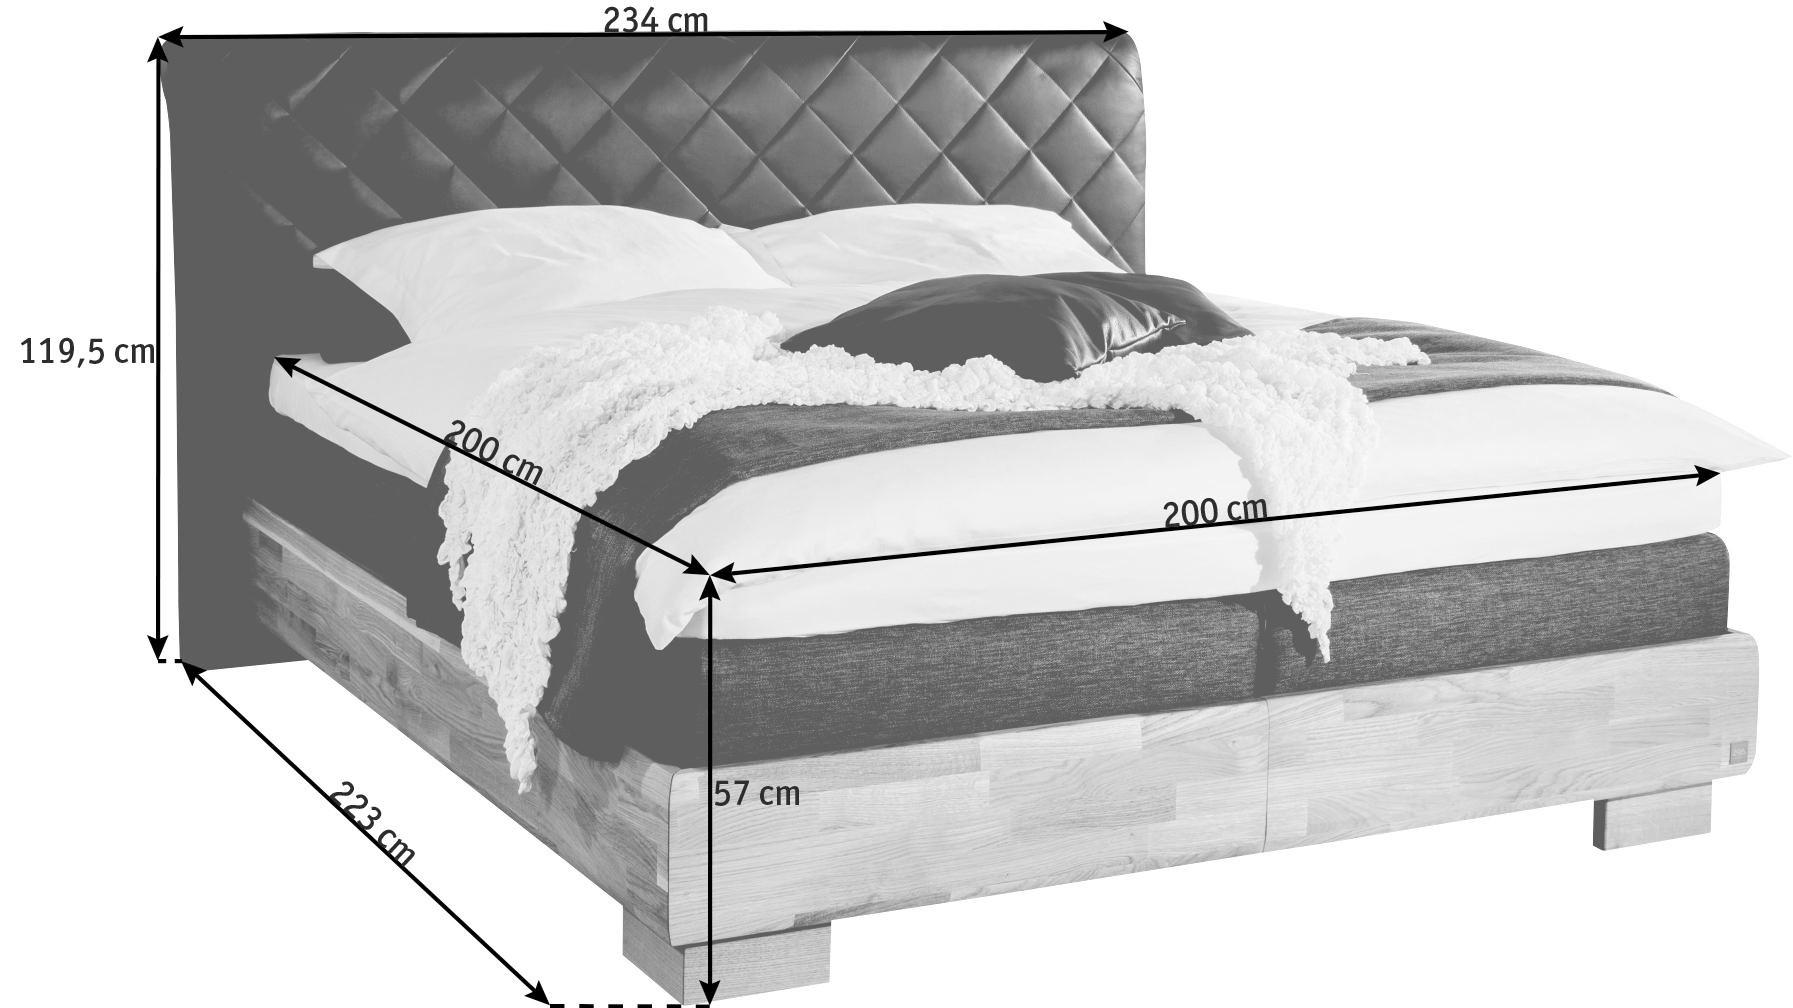 BOXSPRINGBETT 200/200 cm  INKL. Matratze, Topper - Eichefarben/Braun, KONVENTIONELL, Leder/Holz (200/200cm) - NOVEL